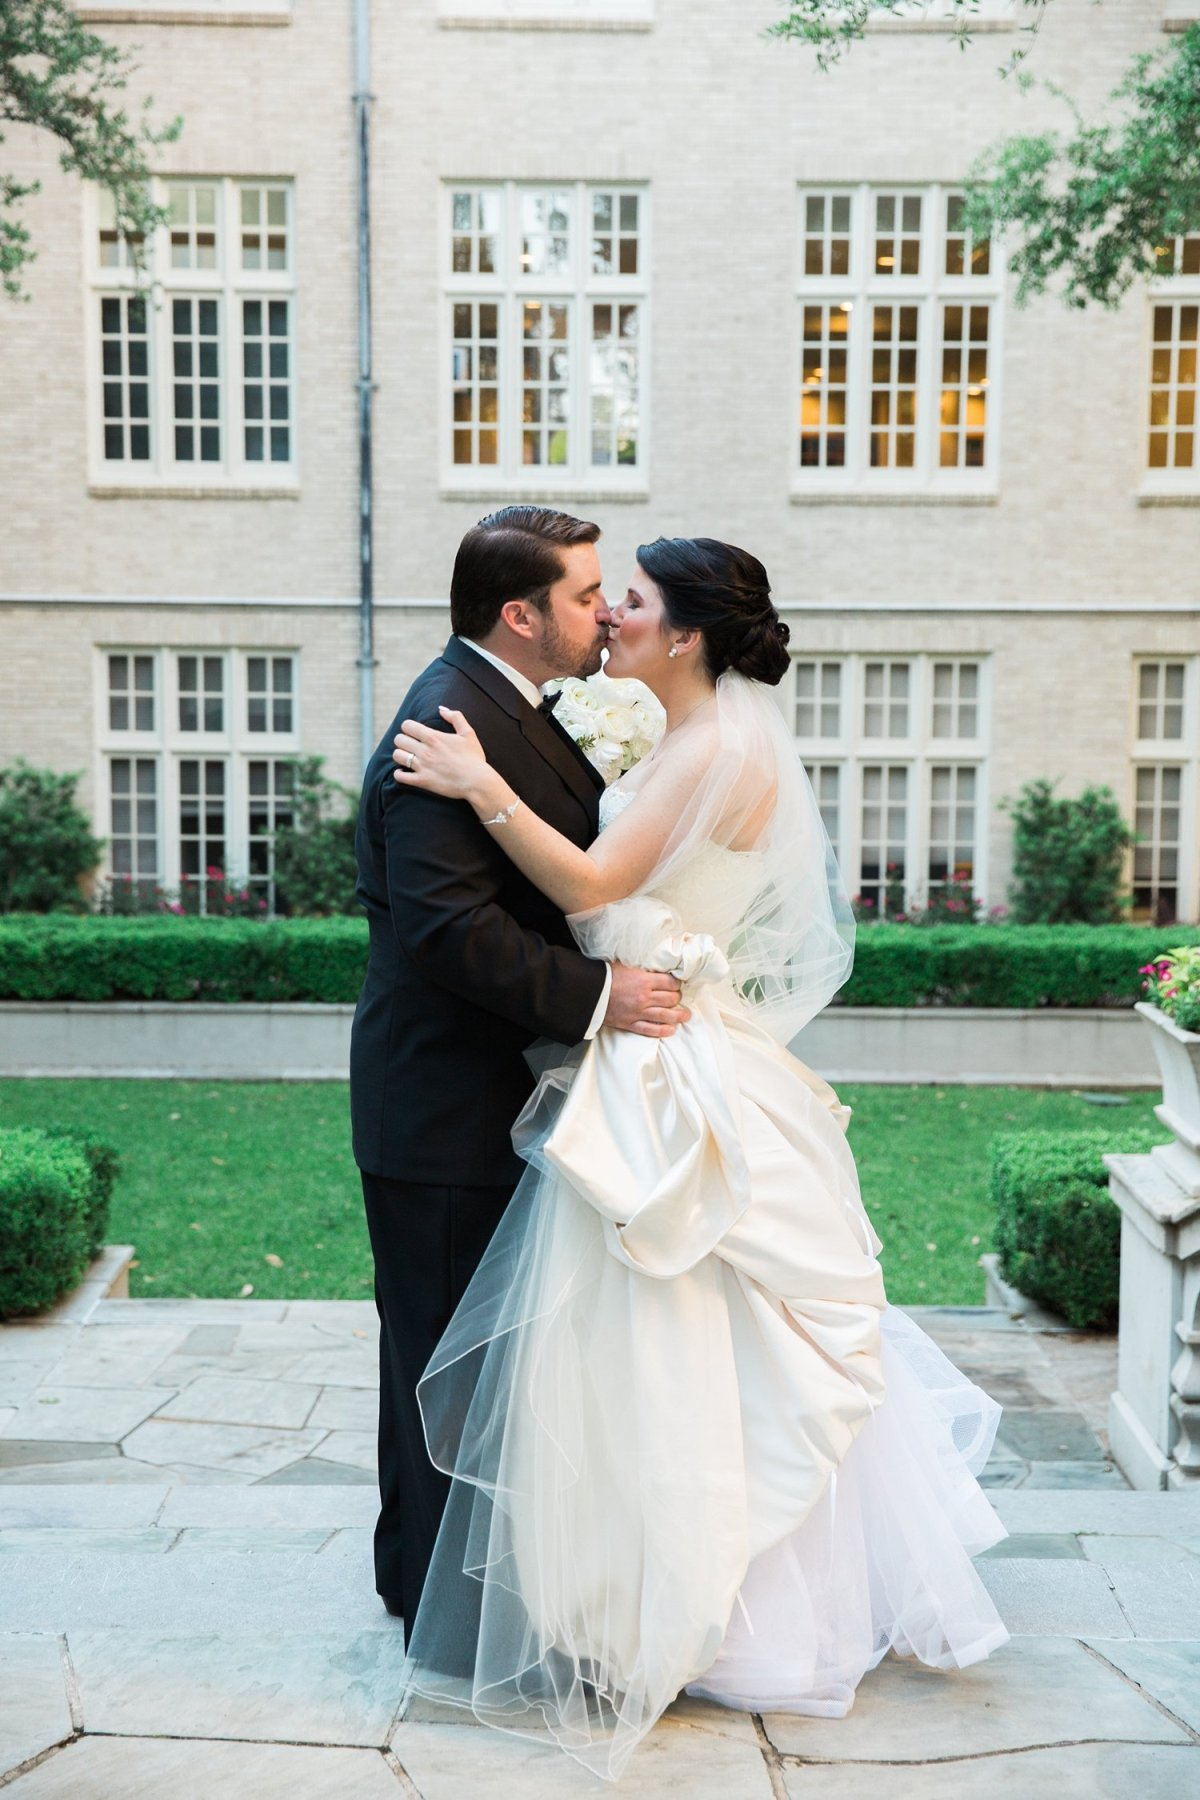 dallas-wedding-dcc-highland-park-hpumc-amanda-jm-18